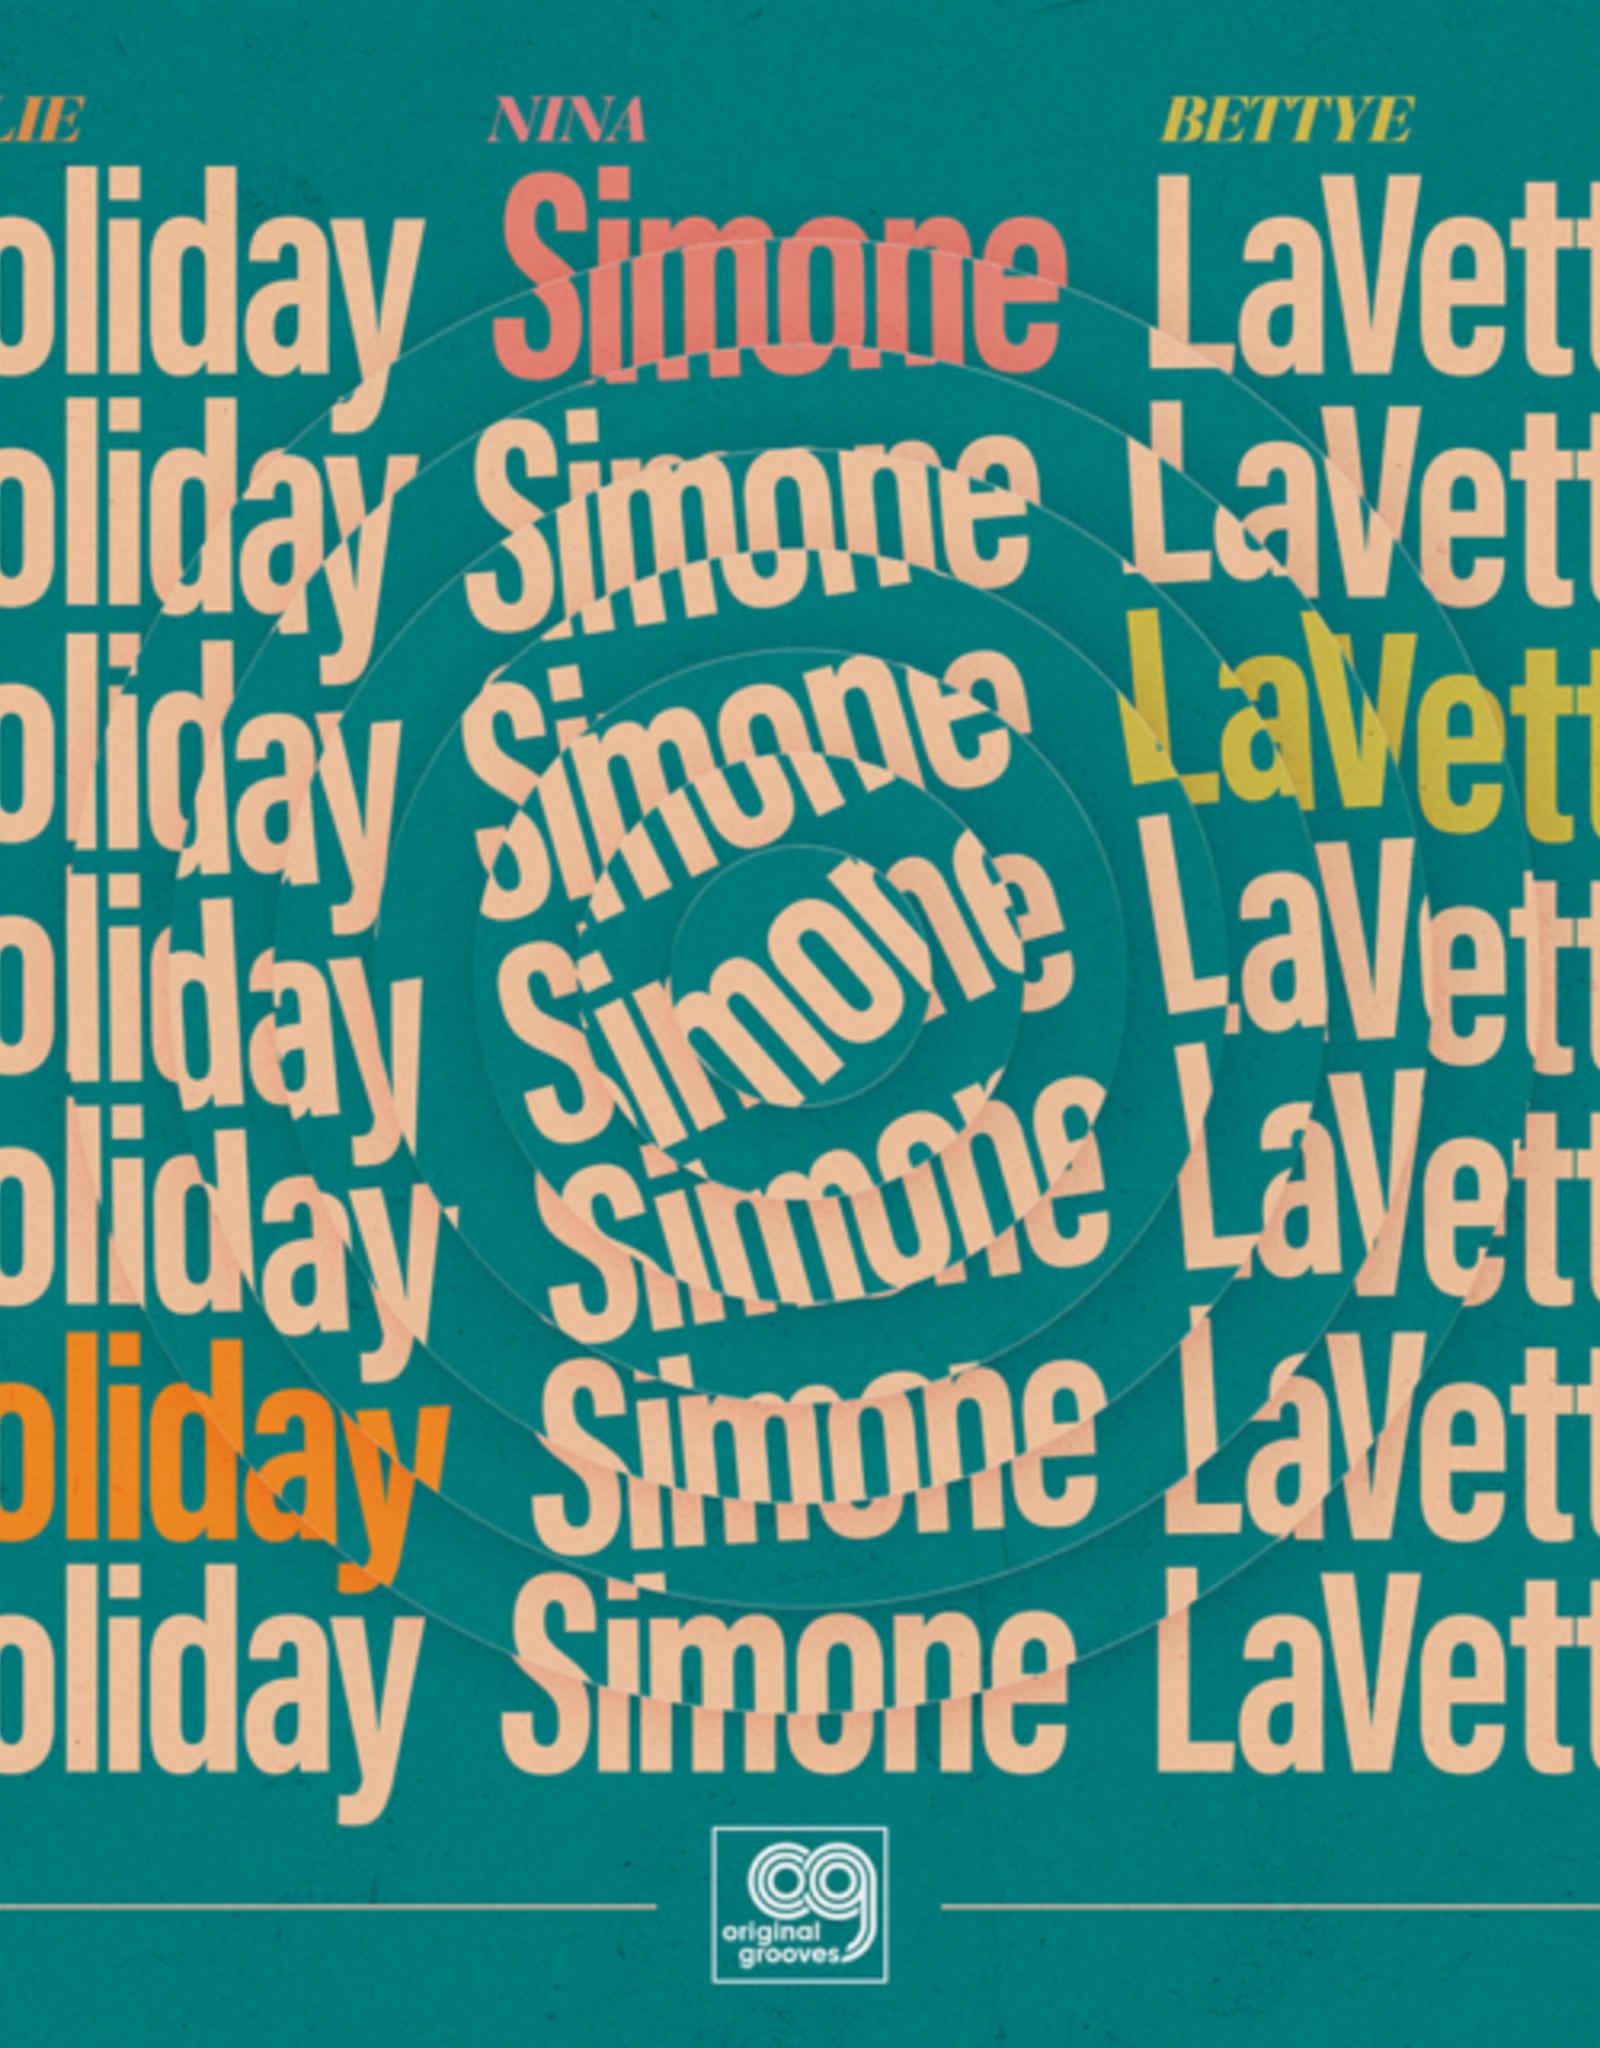 Bettye Lavette; Billie Holiday; Nina Simone - Original Grooves: Billie Holiday, Nina Simone, Bettye Lavette (Ep) (RSD 2020 BF)